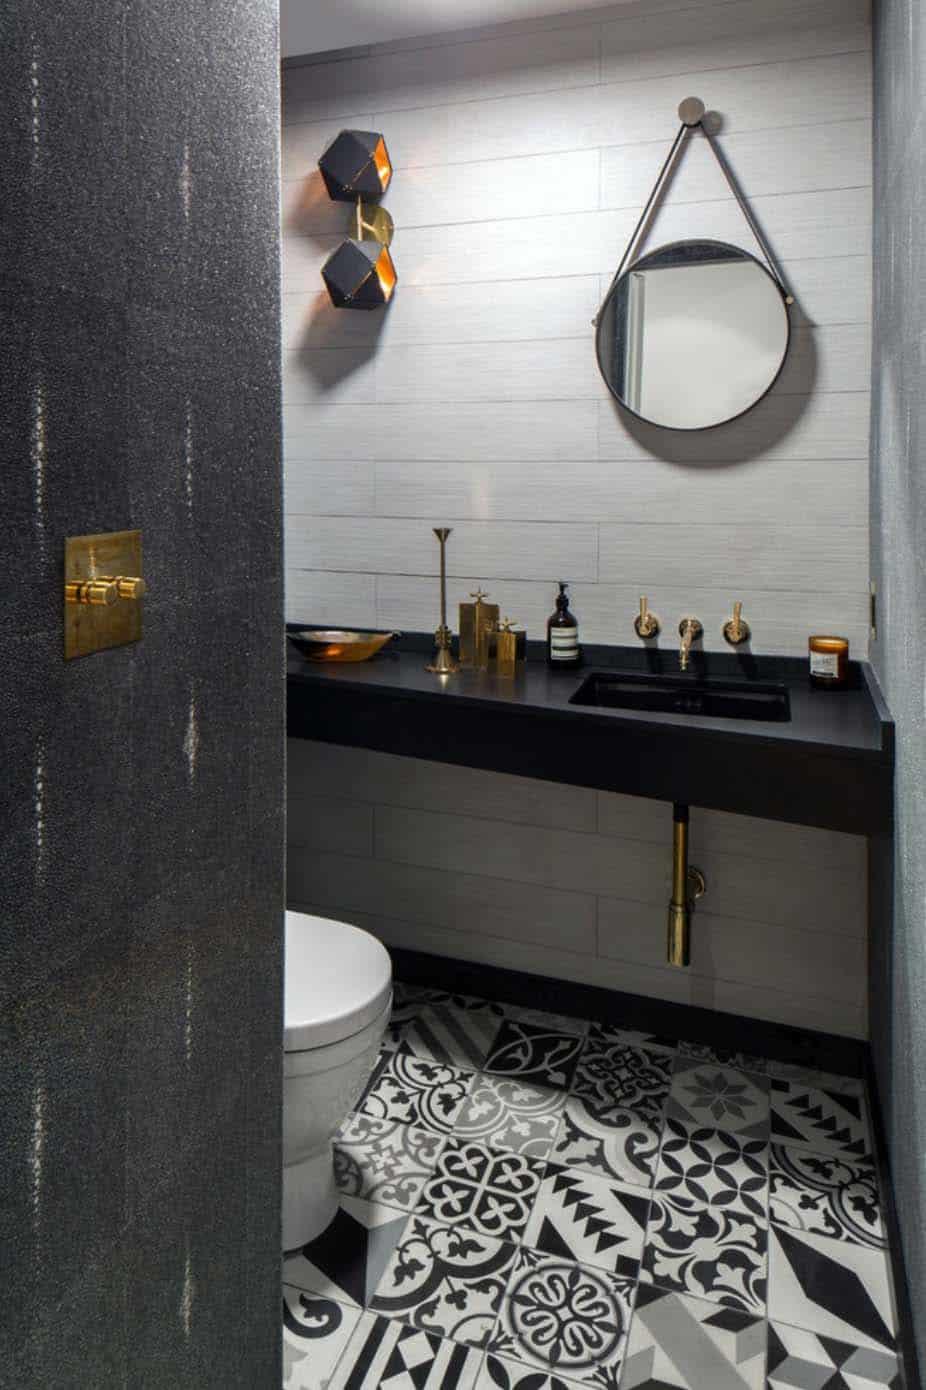 One Kindesigns Top 35 Pinterest Bathroom Pins Of 2016